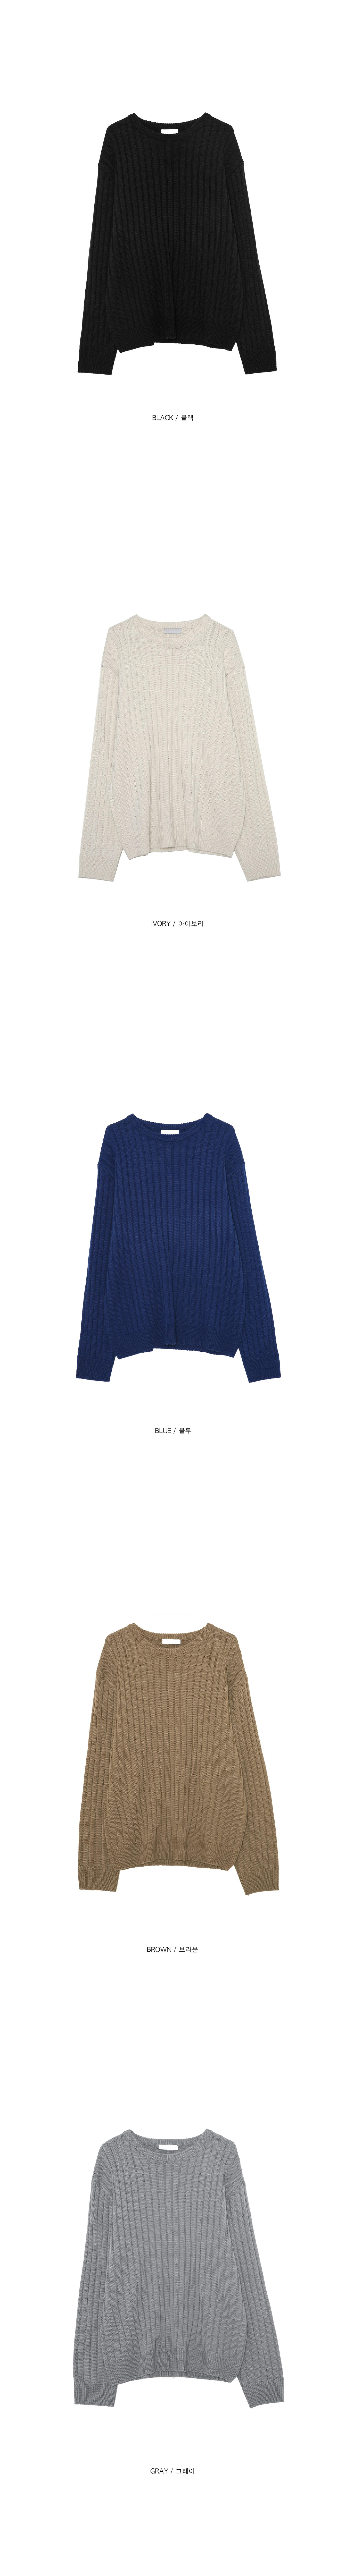 regular golgi knit - men